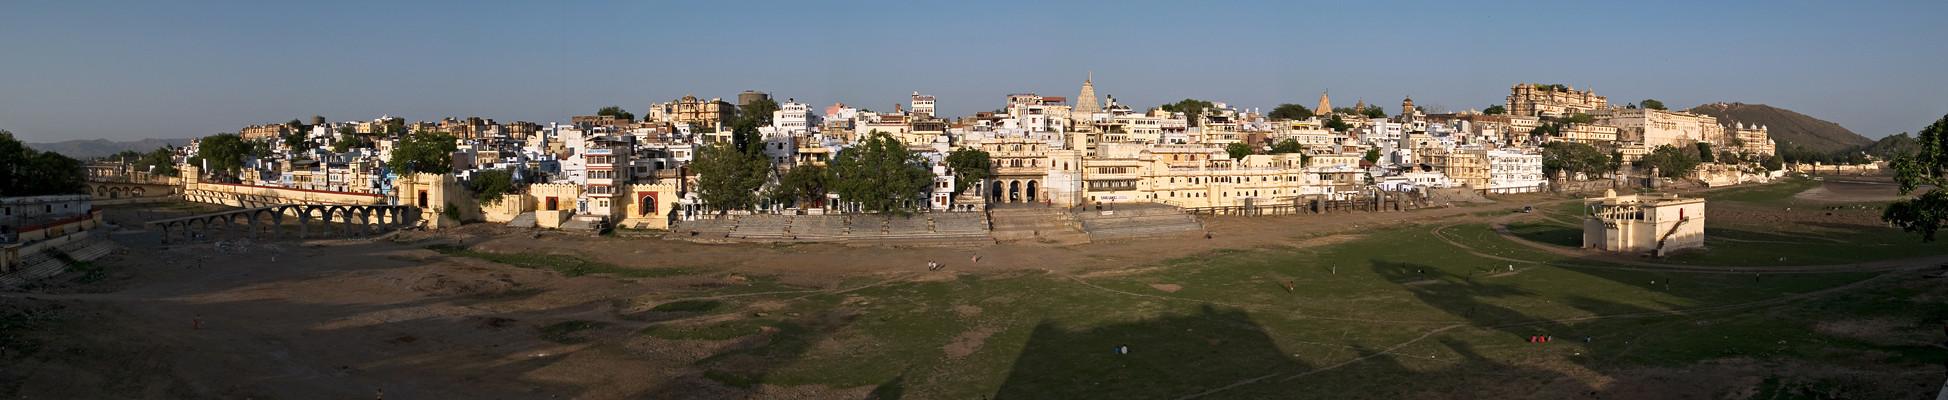 Panorama de Udaipur